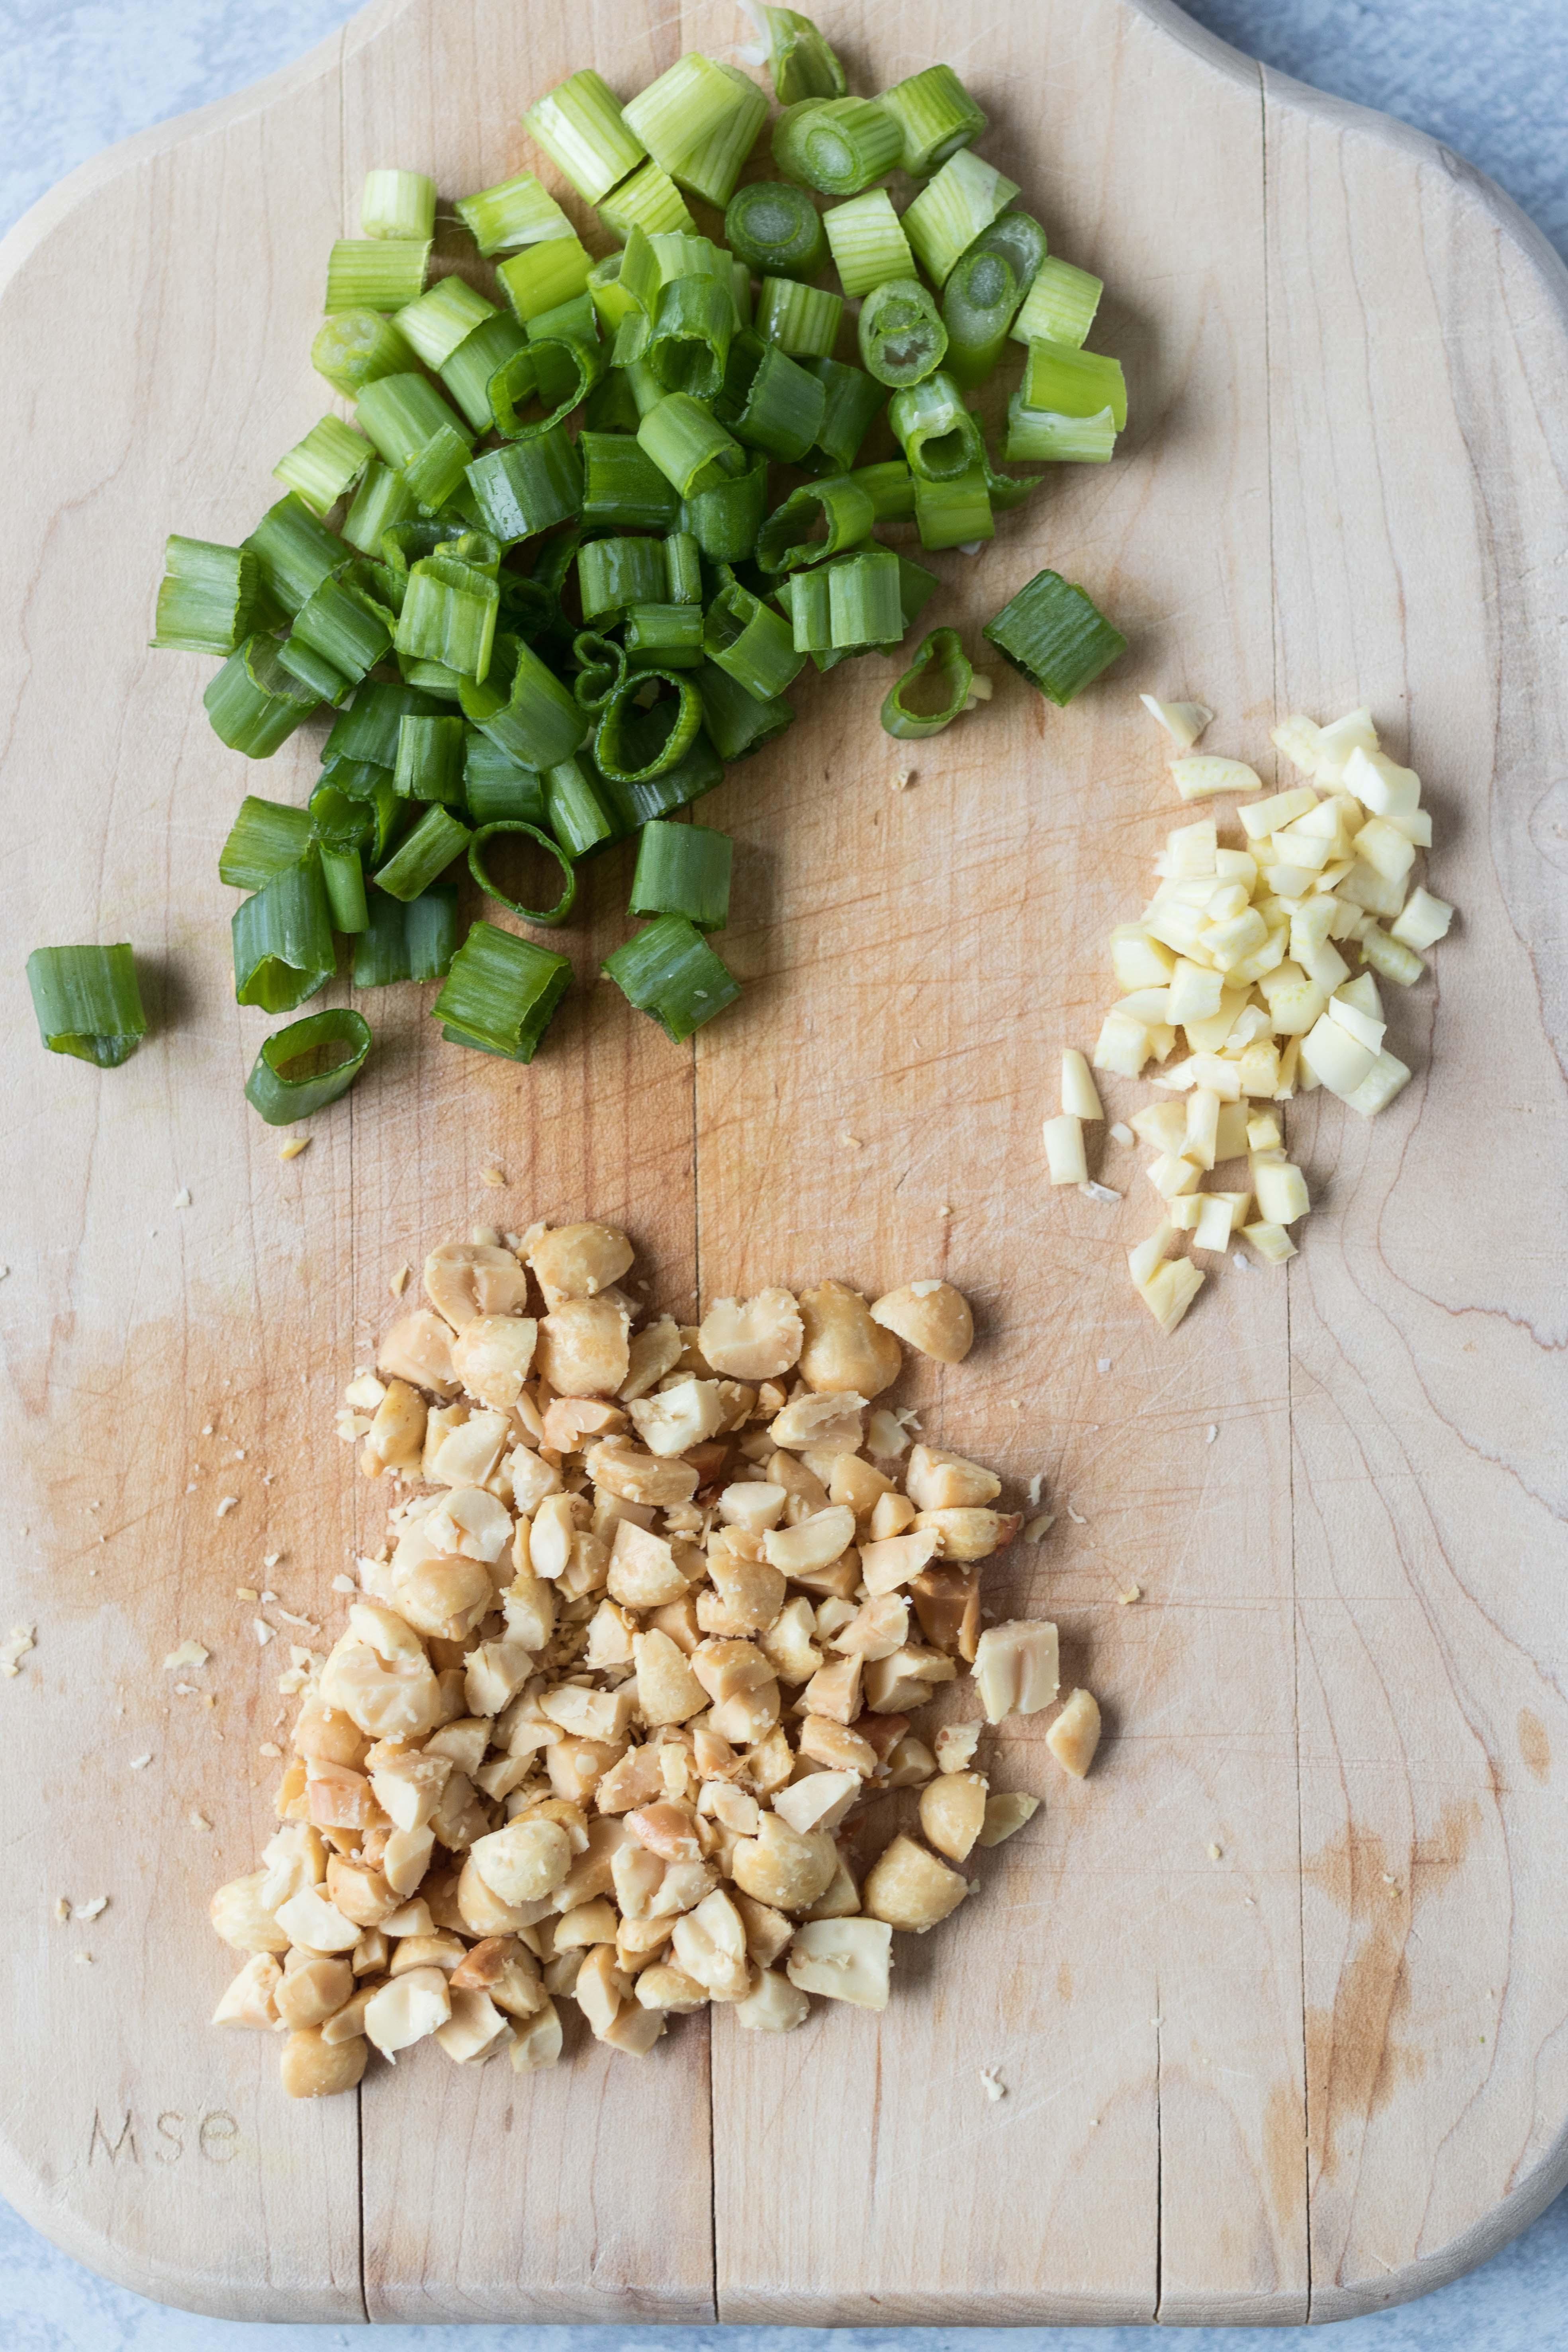 Chopped green onion, peanuts, and garlic for peanut sesame Ramen. Quick, healthy lunch dish! #healthylunchidea #sesameRamen #peanutnoodles | https://www.roseclearfield.com